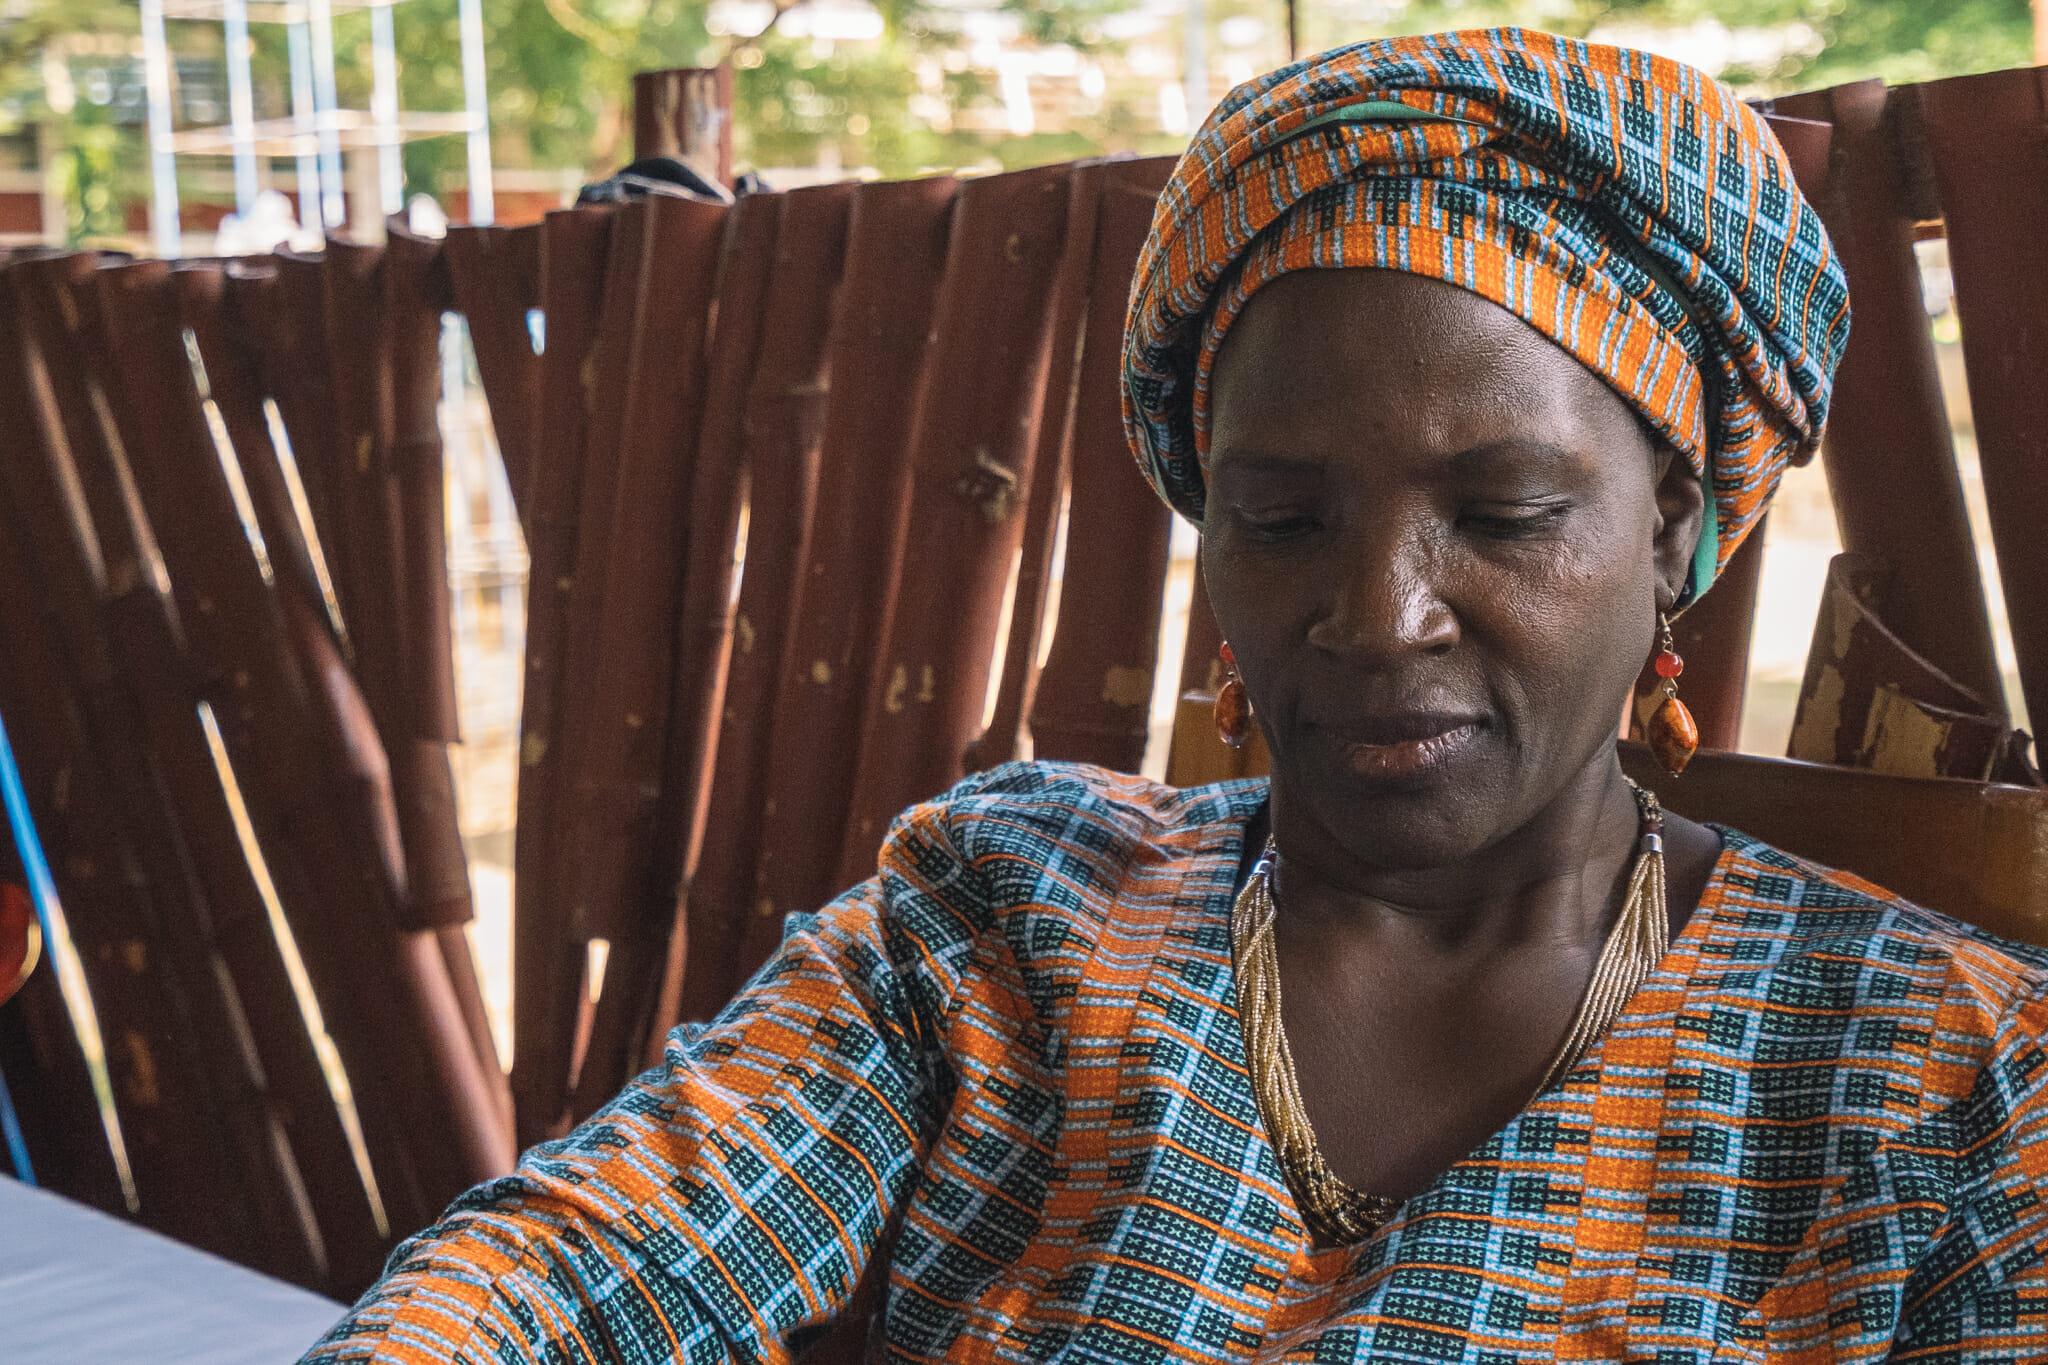 Rencontre avec les fondatrices de Moshi Mama en Tanzanie